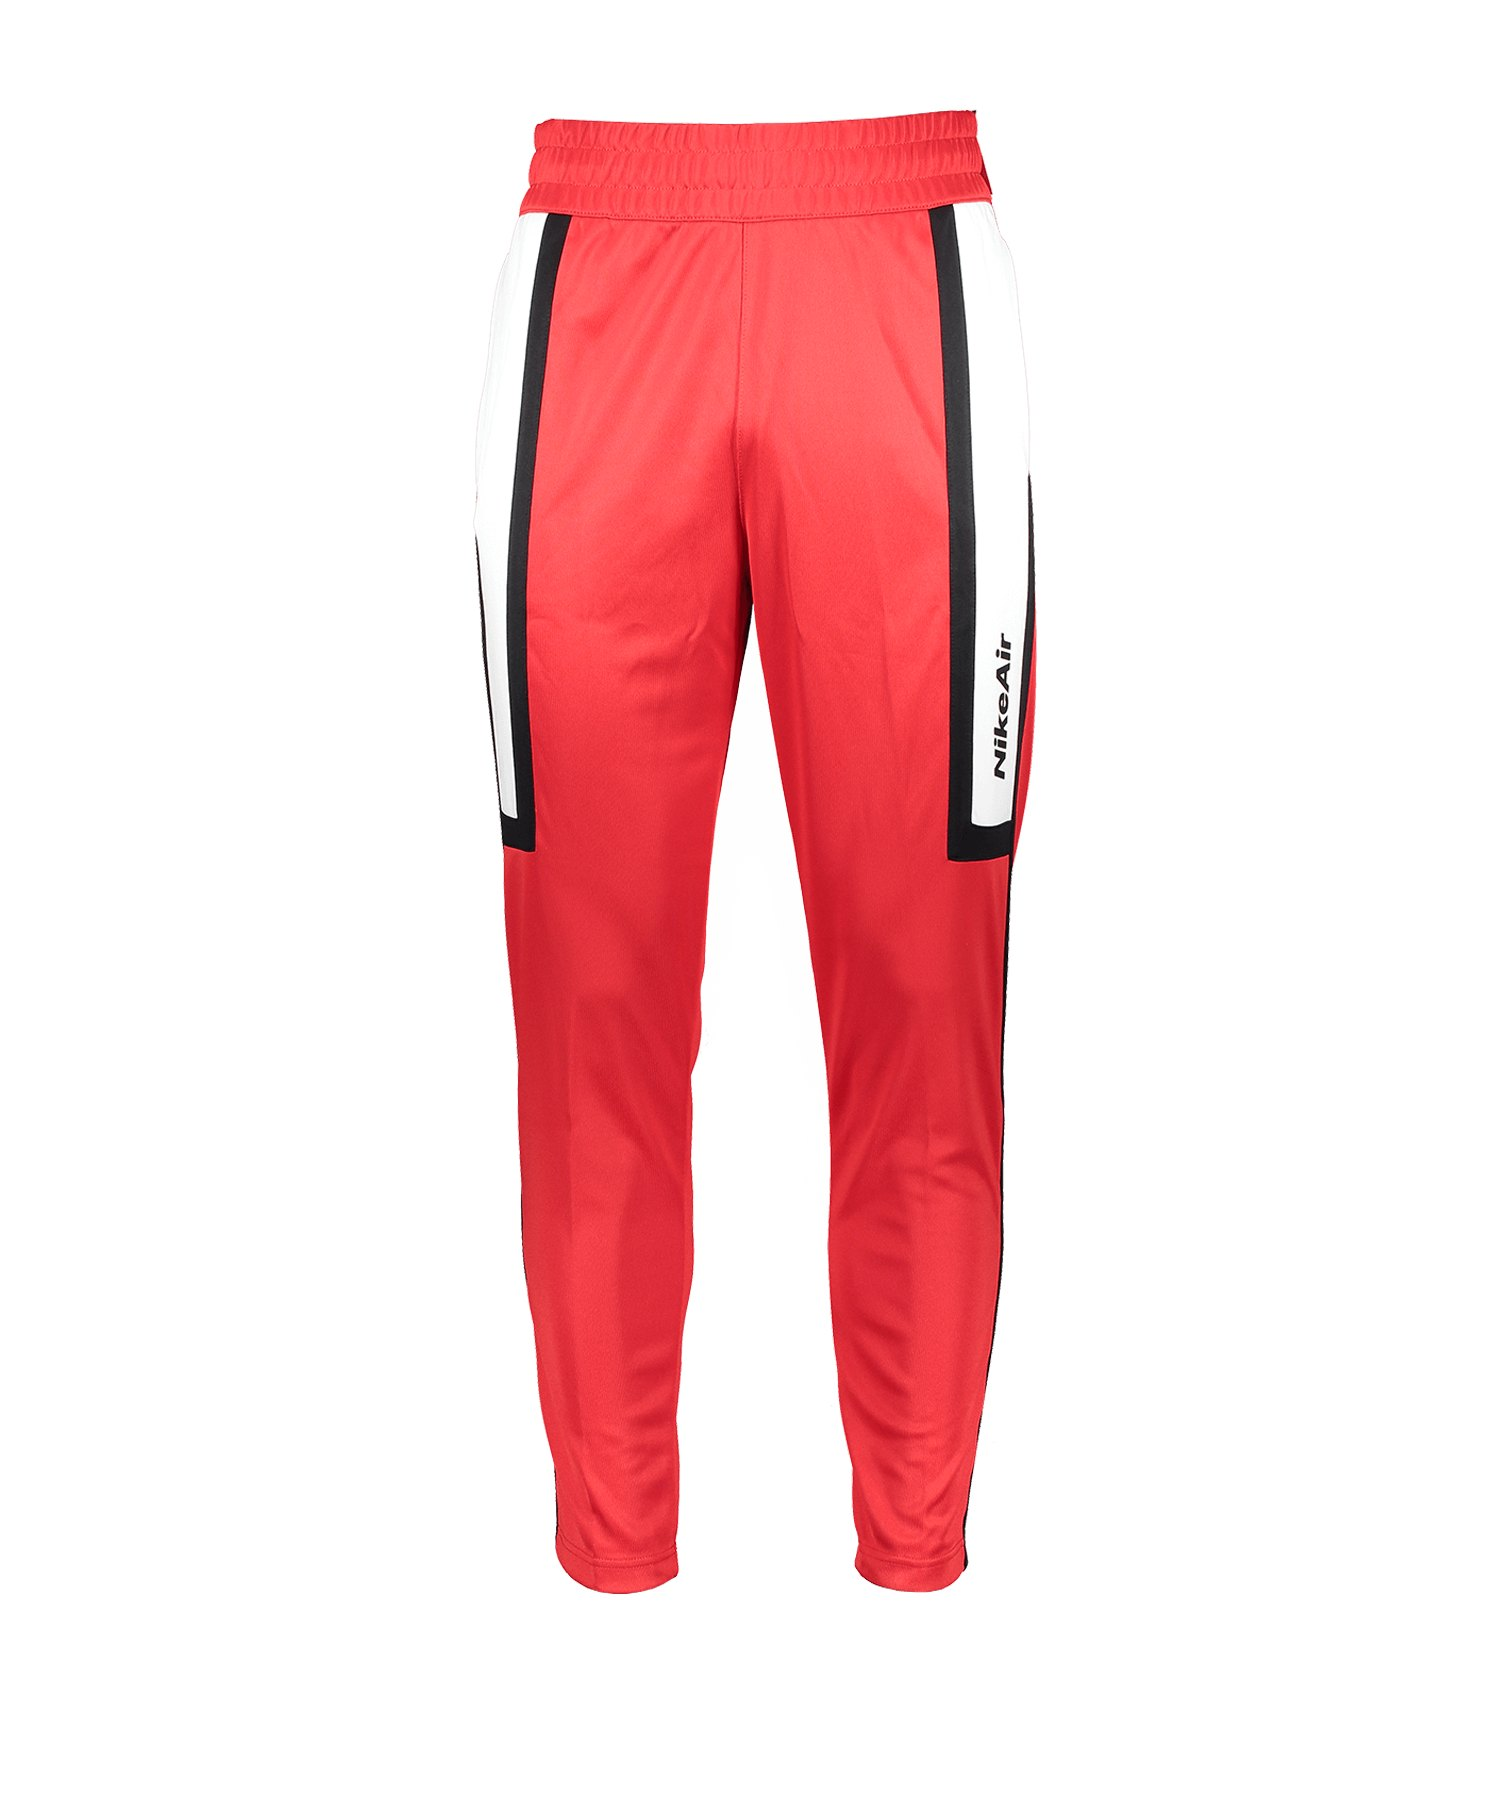 Nike Air Jogginghose Rot F657 - rot